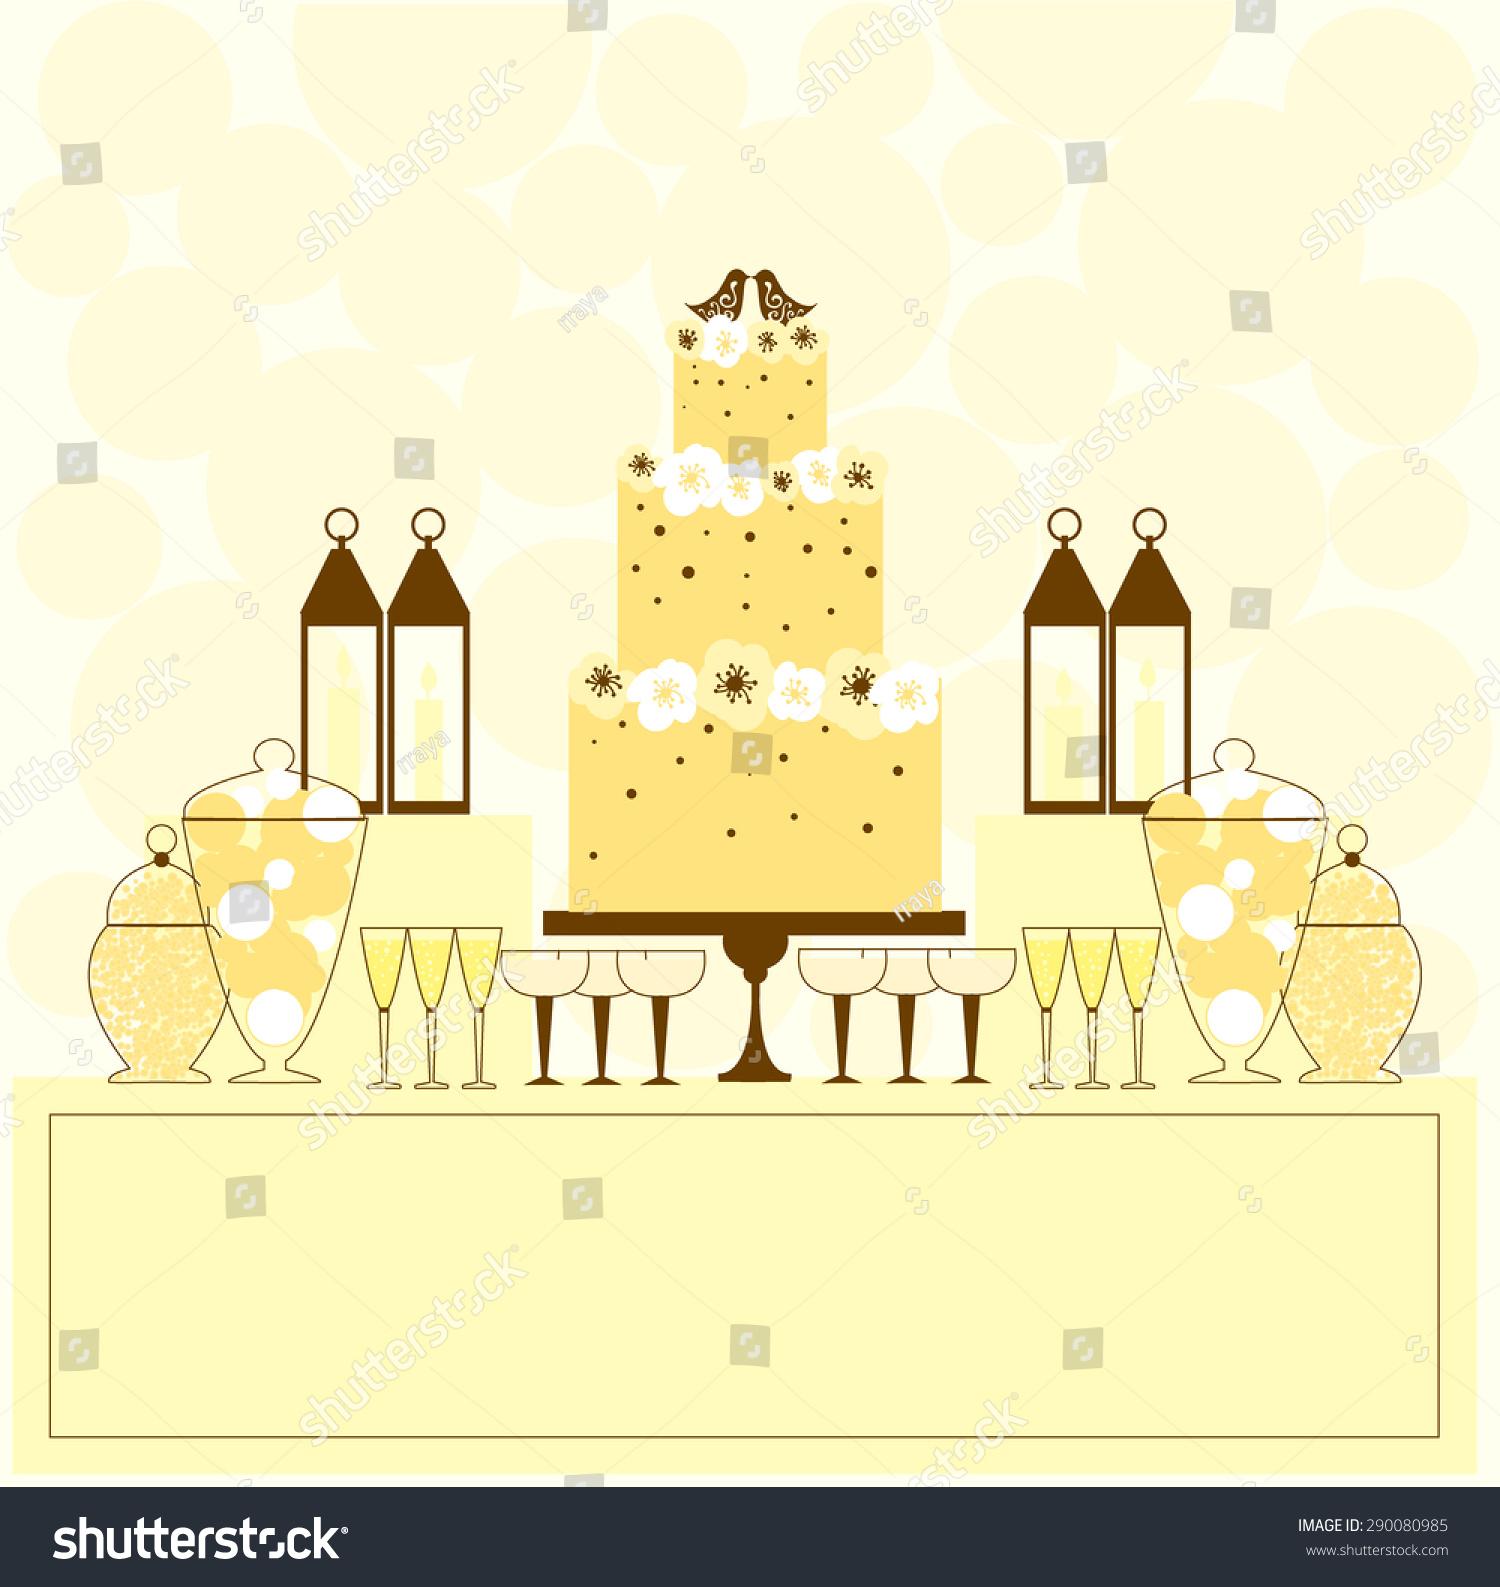 Wedding Cake Dessert Table Vector Illustration Stock Vector (Royalty ...